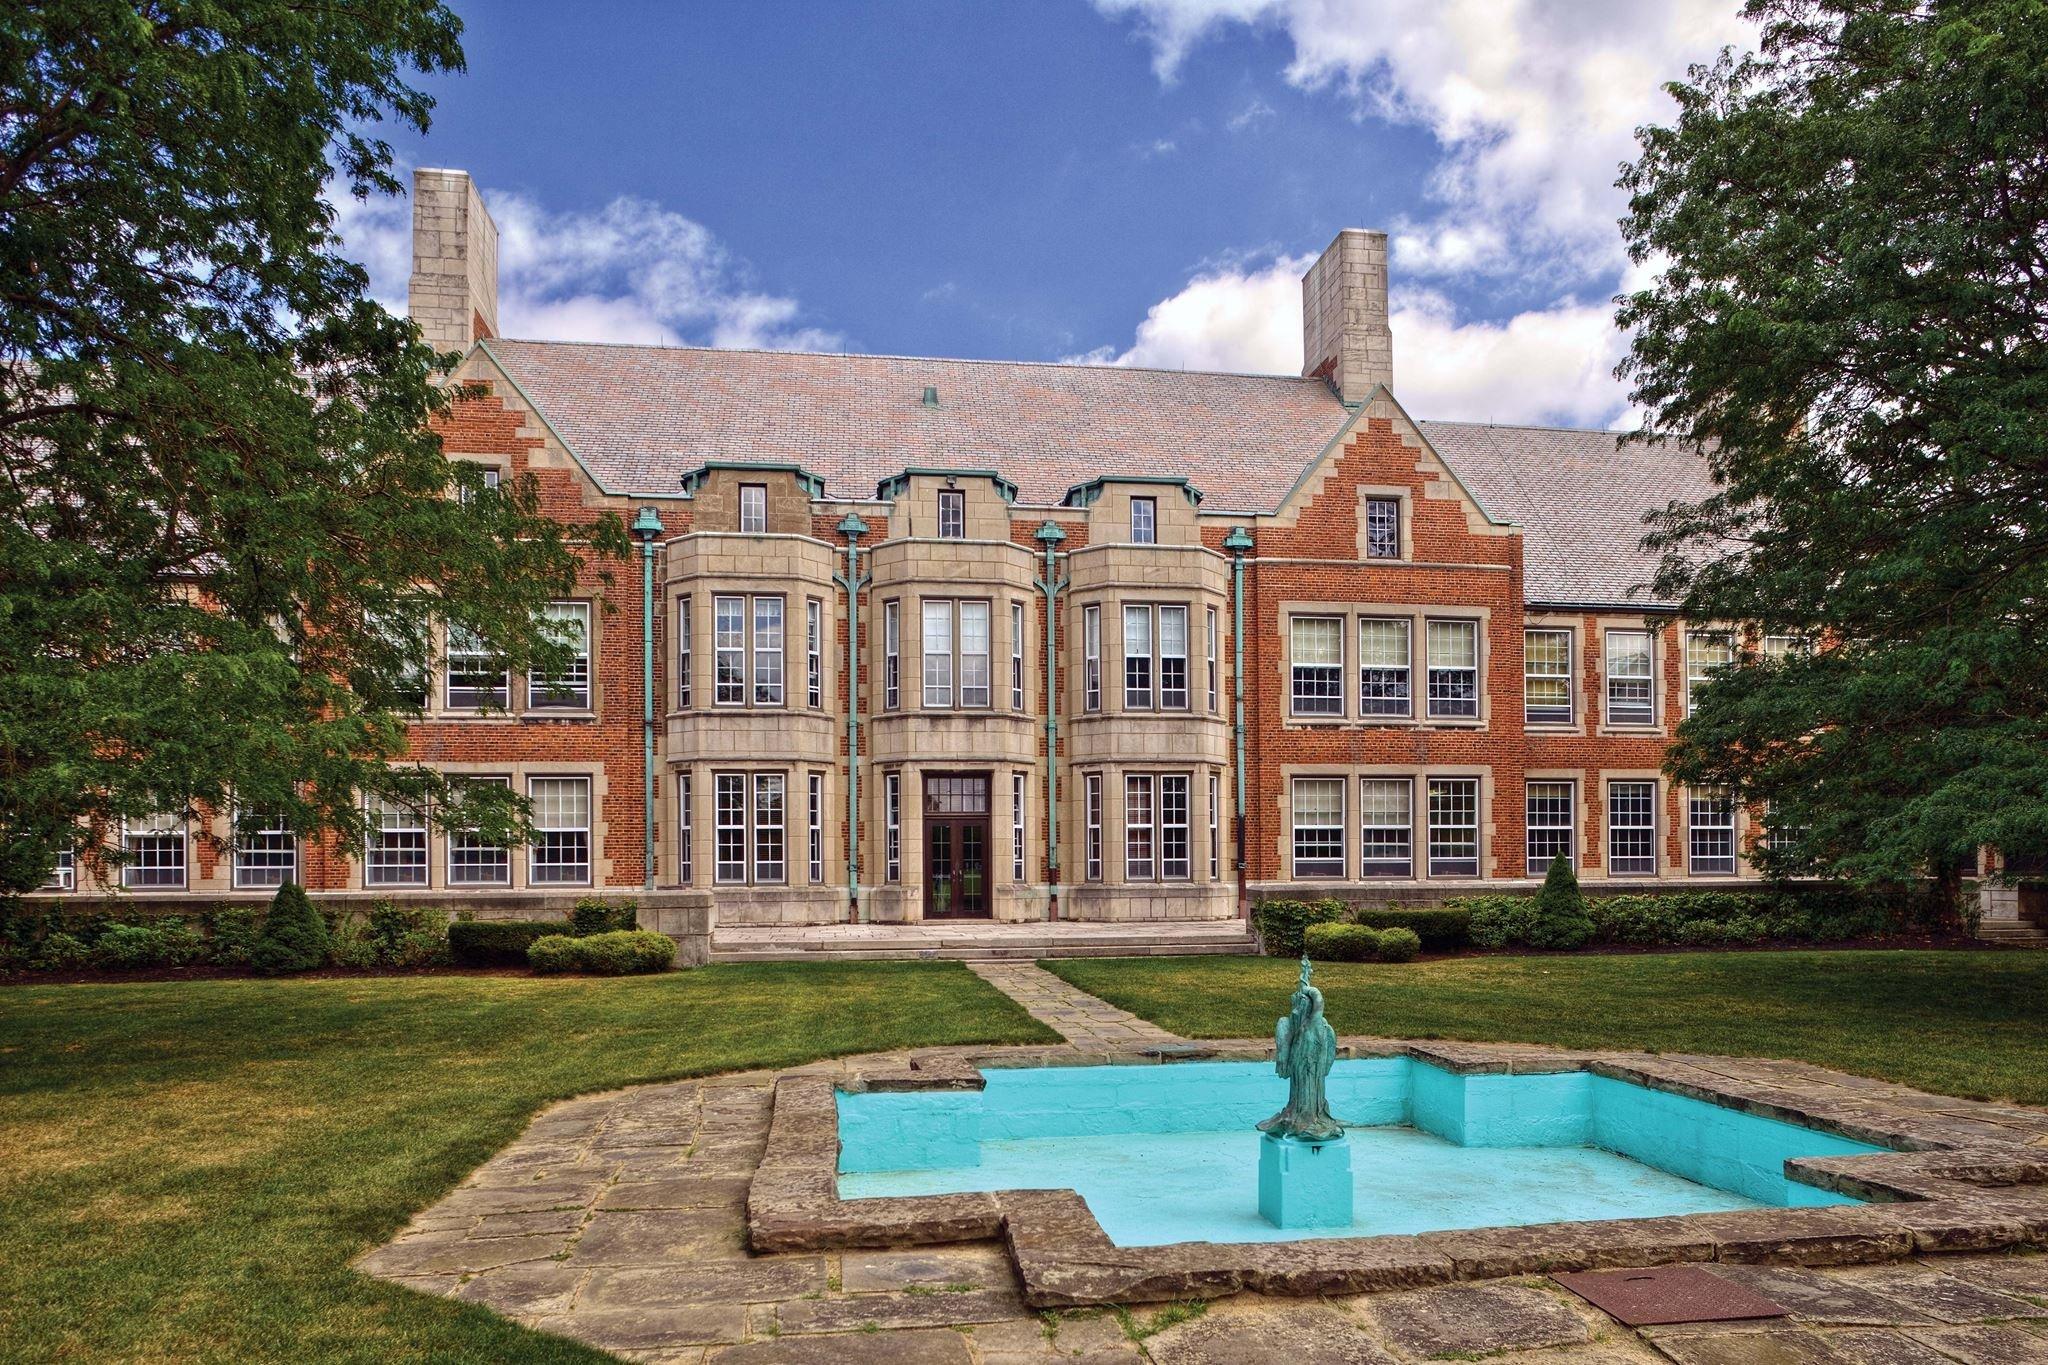 Hathaway Brown School in Shaker Heights, Ohio